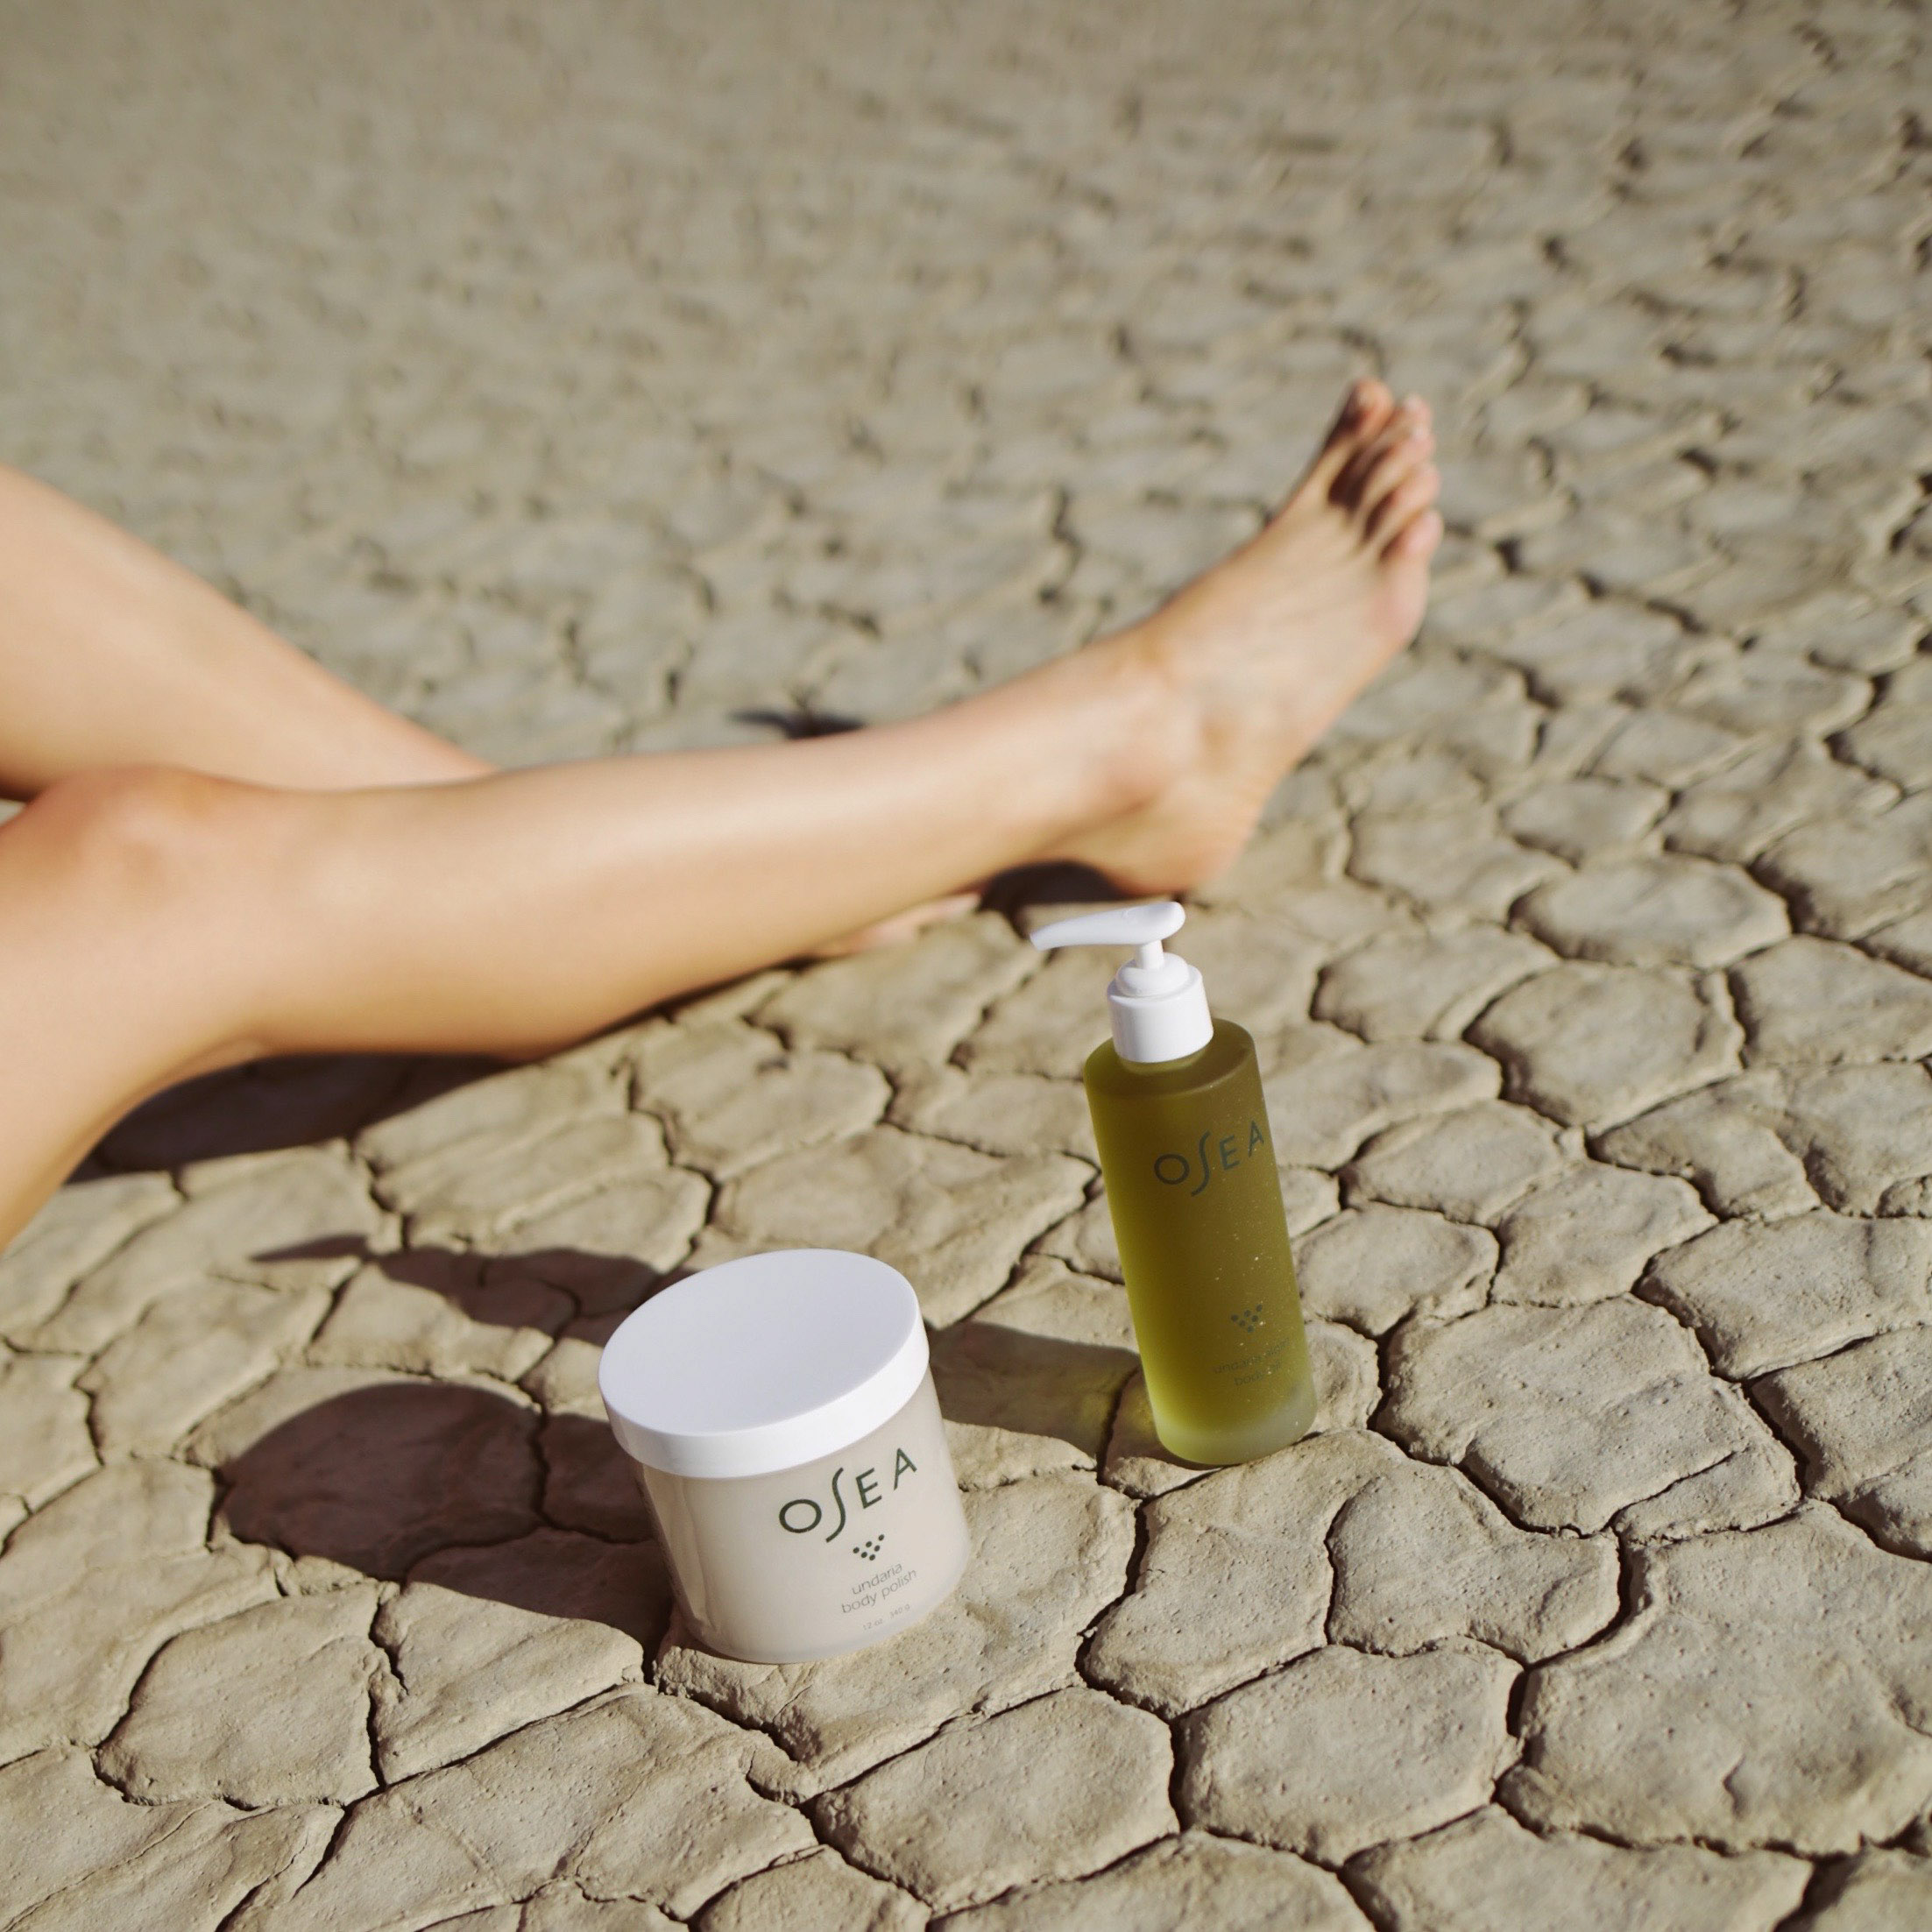 Osea Malibu clean beauty scrub natural scrub sustainable summer beach